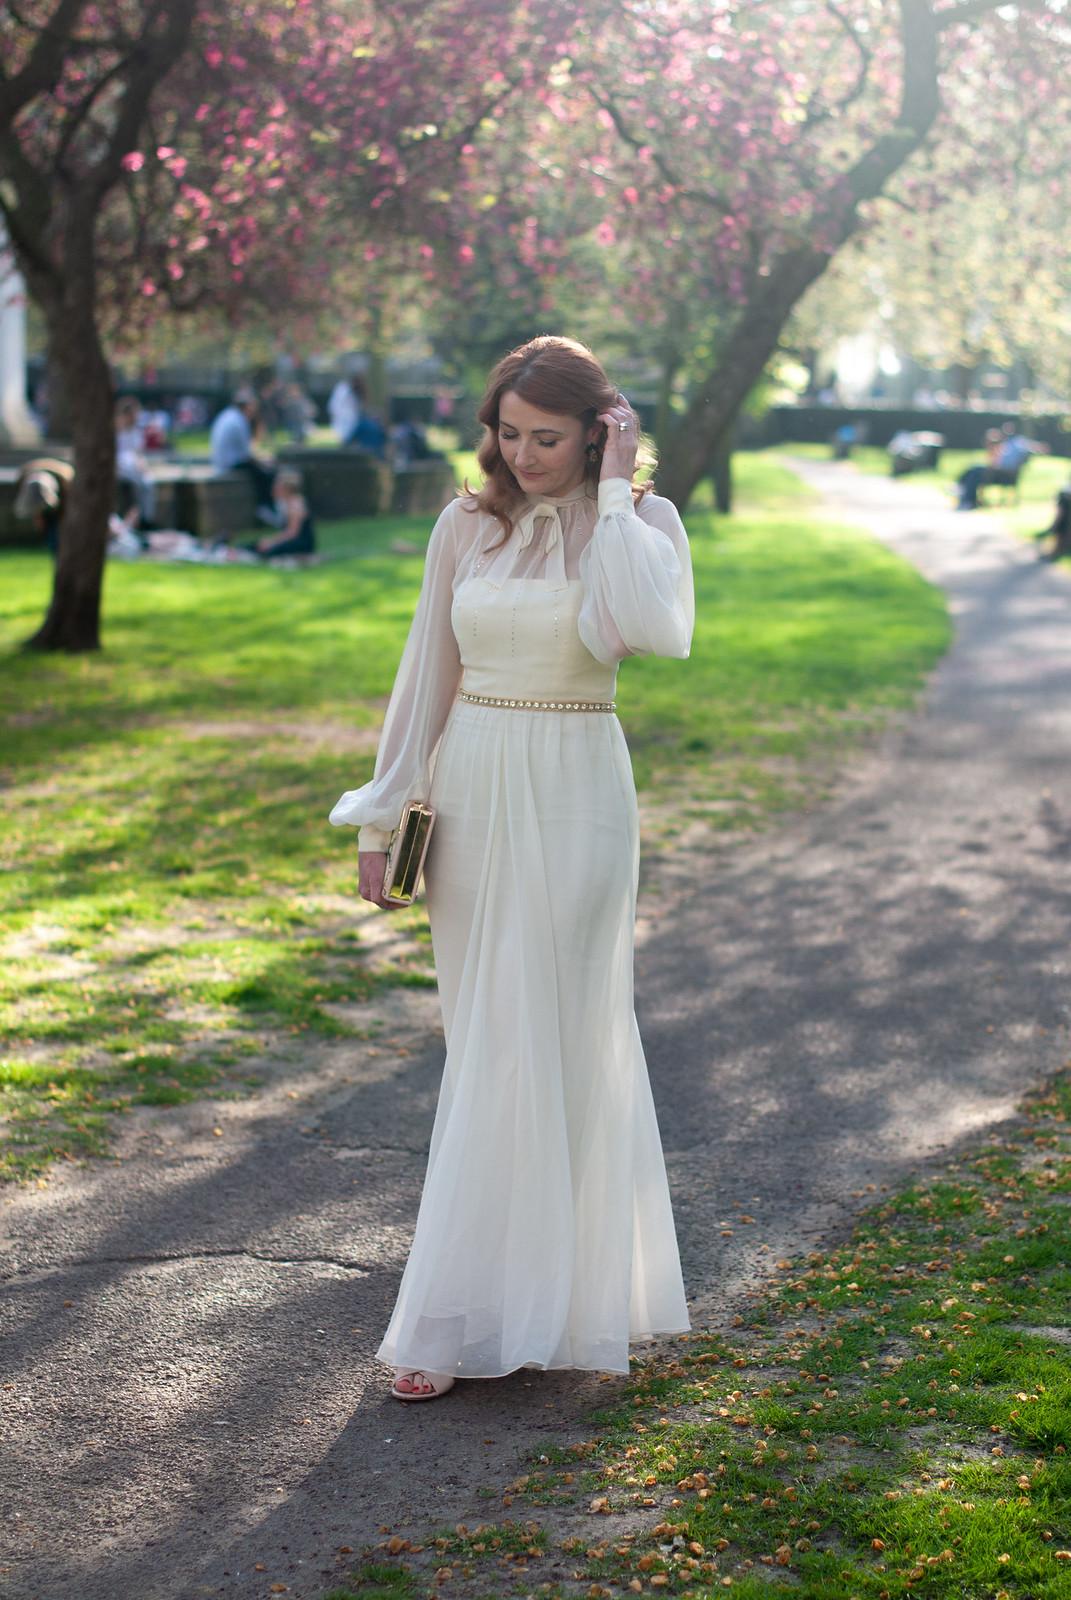 An Ethereal Vintage Evening Dress for the UK Blog Awards (I Won!)